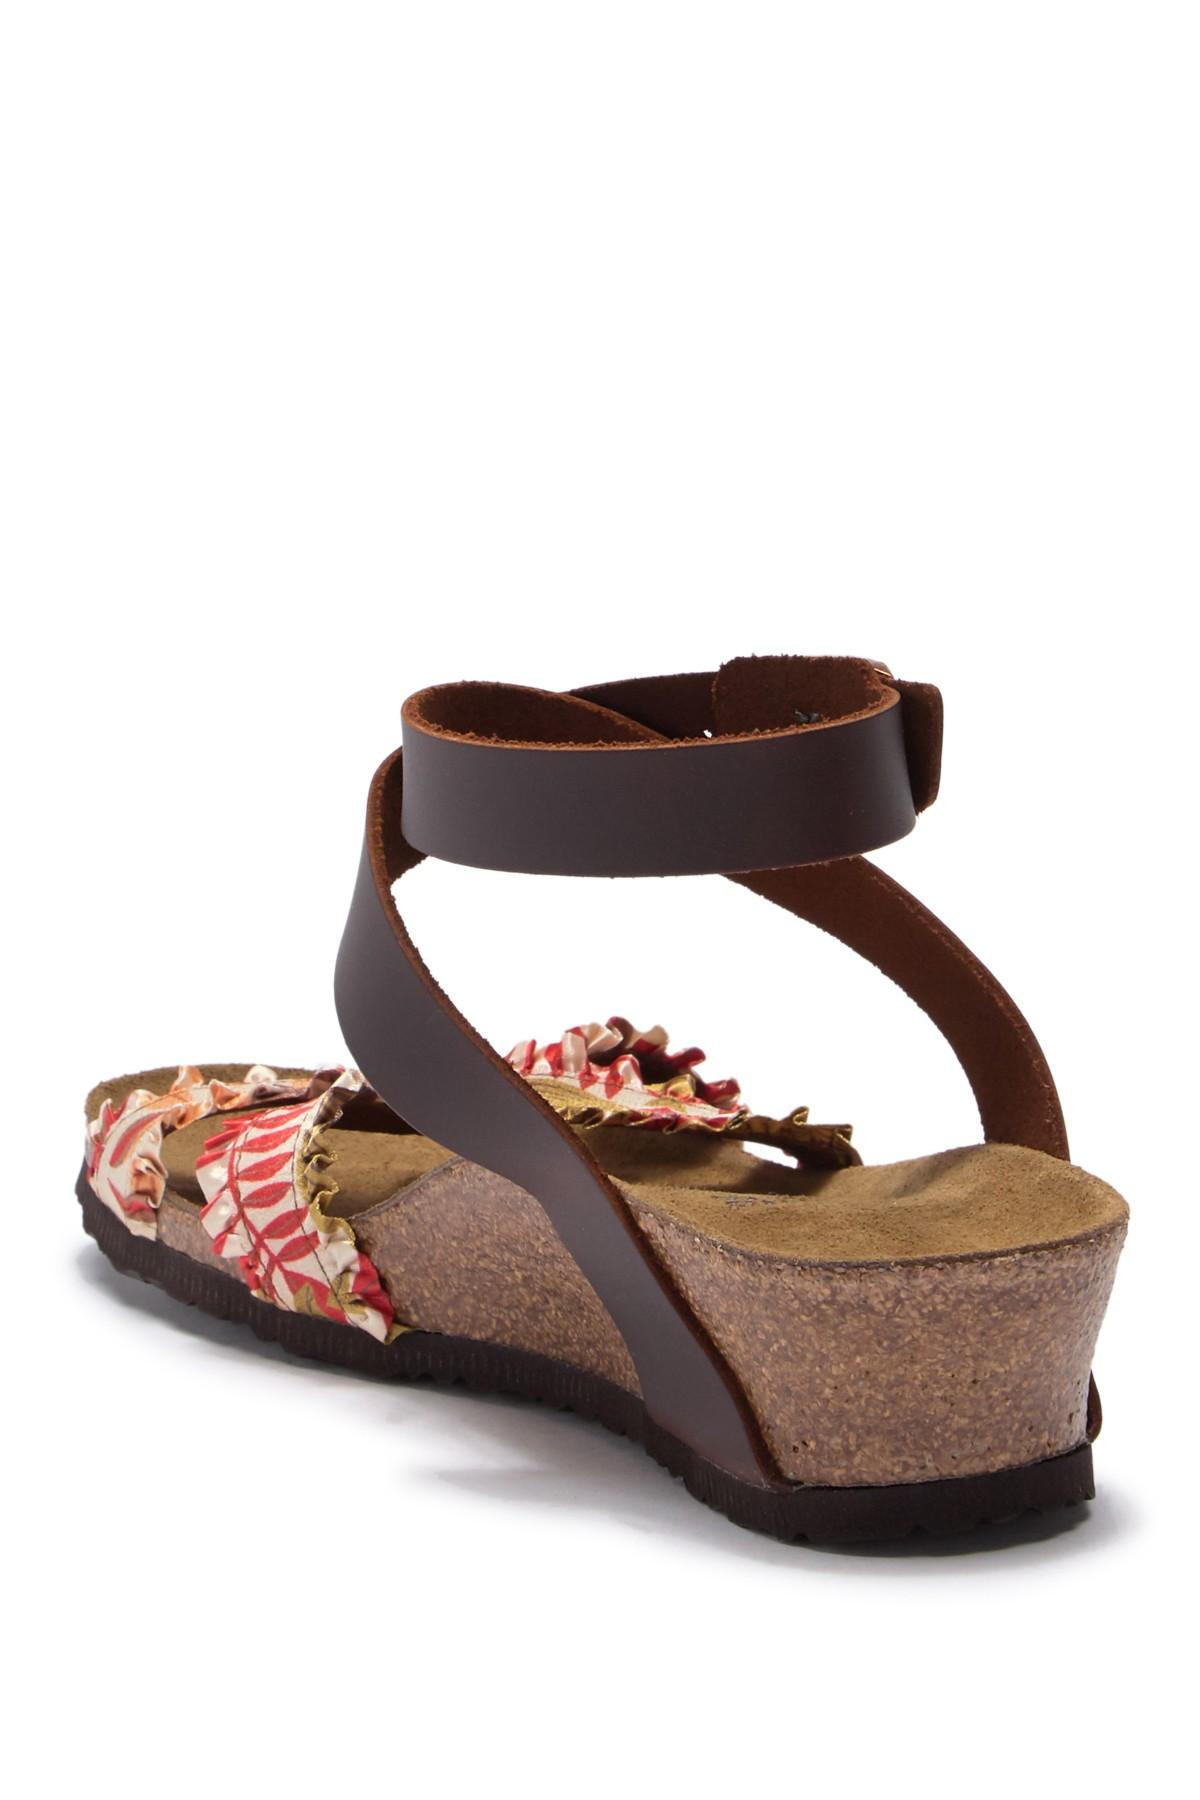 2a8724e48f2b Birkenstock - Brown Lola Wedge Sandal - Discontinued - Lyst. View fullscreen